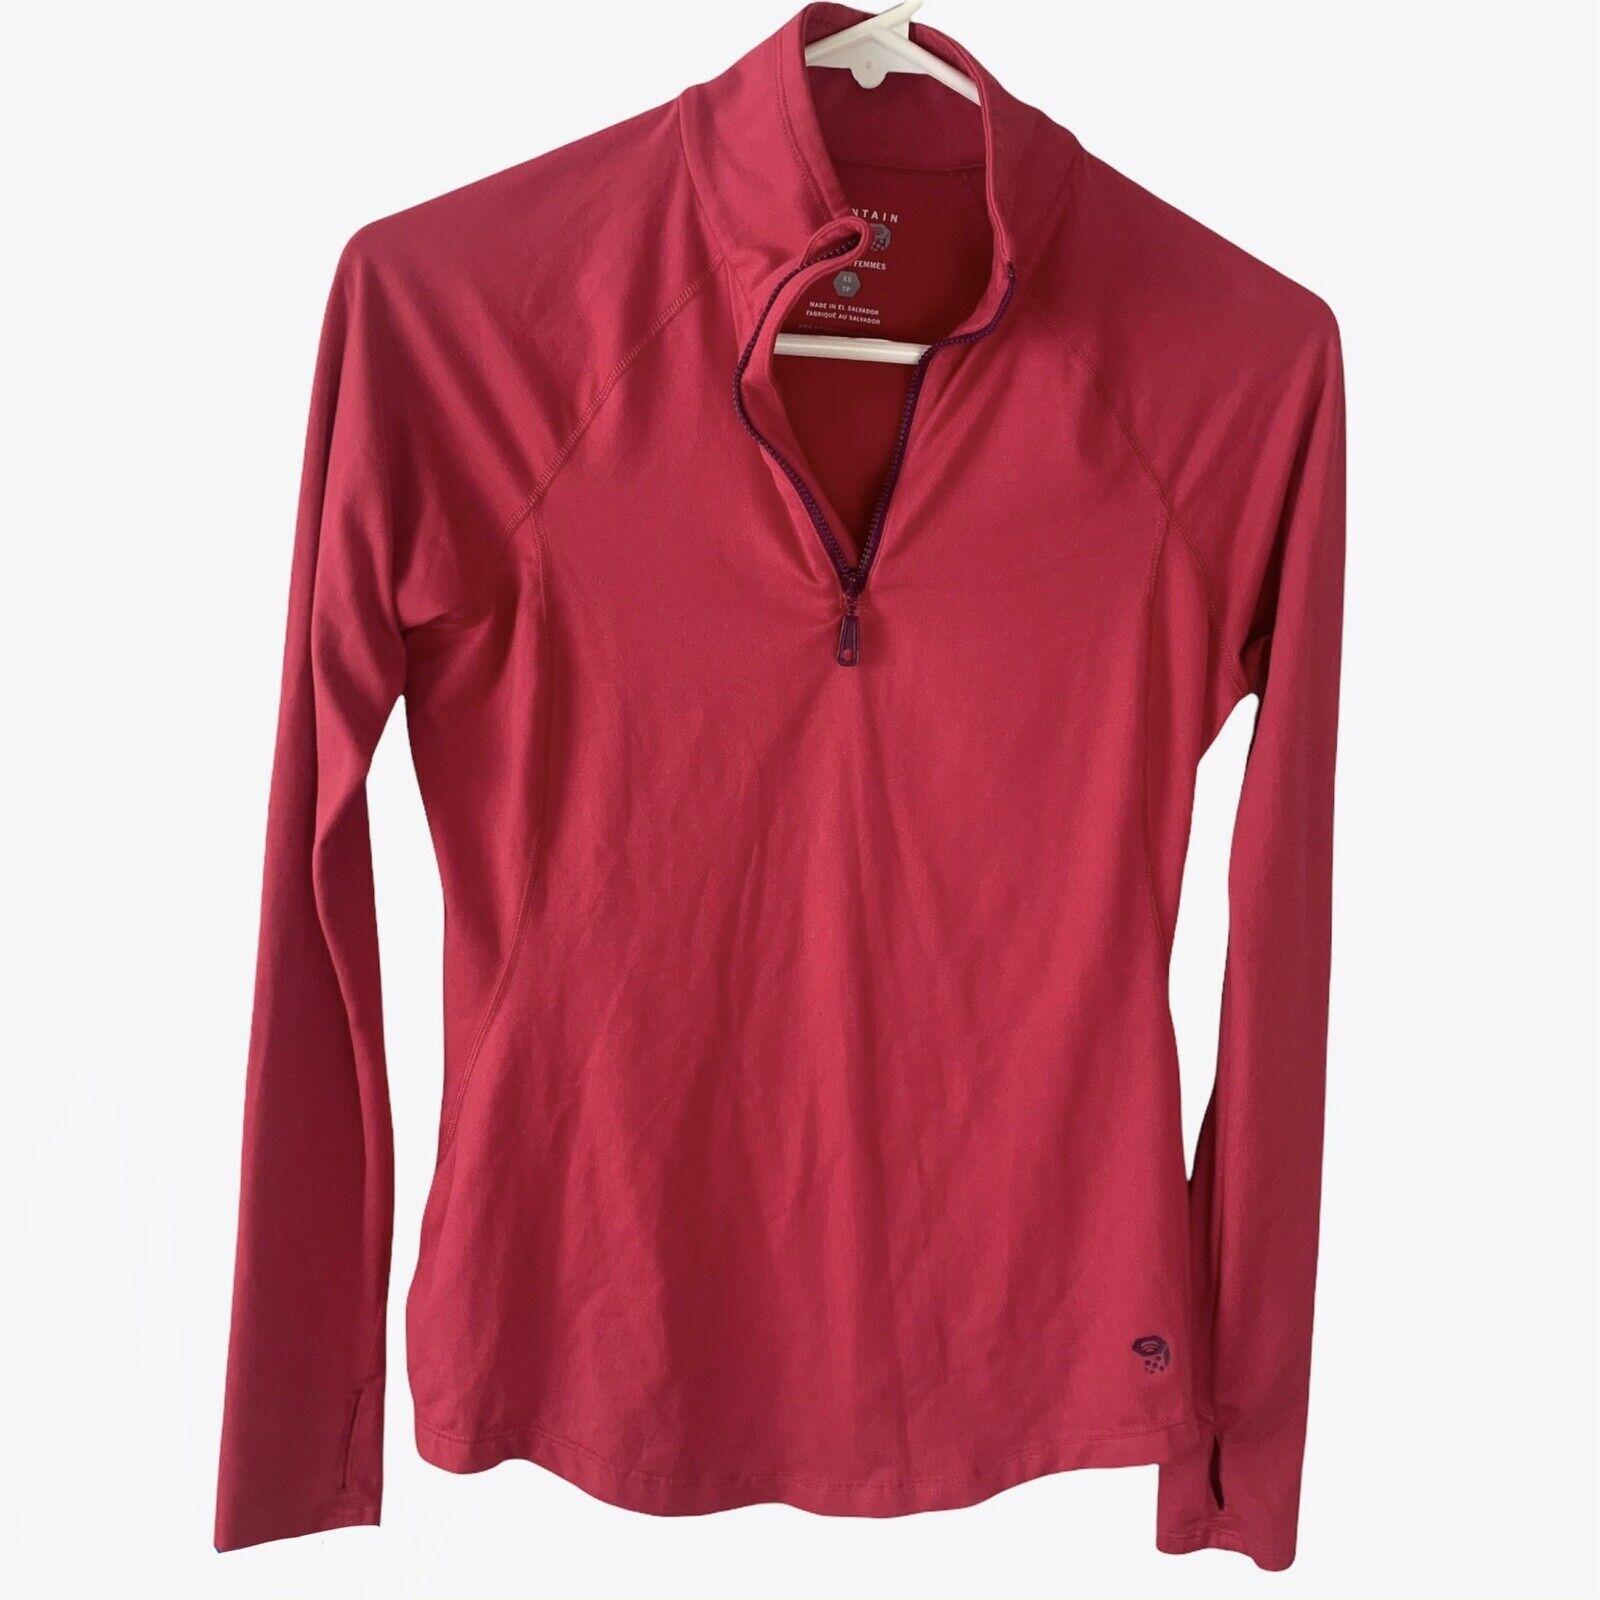 Mountain Hardwear women's butter zippity top Size XSmall soft feel thumb holes